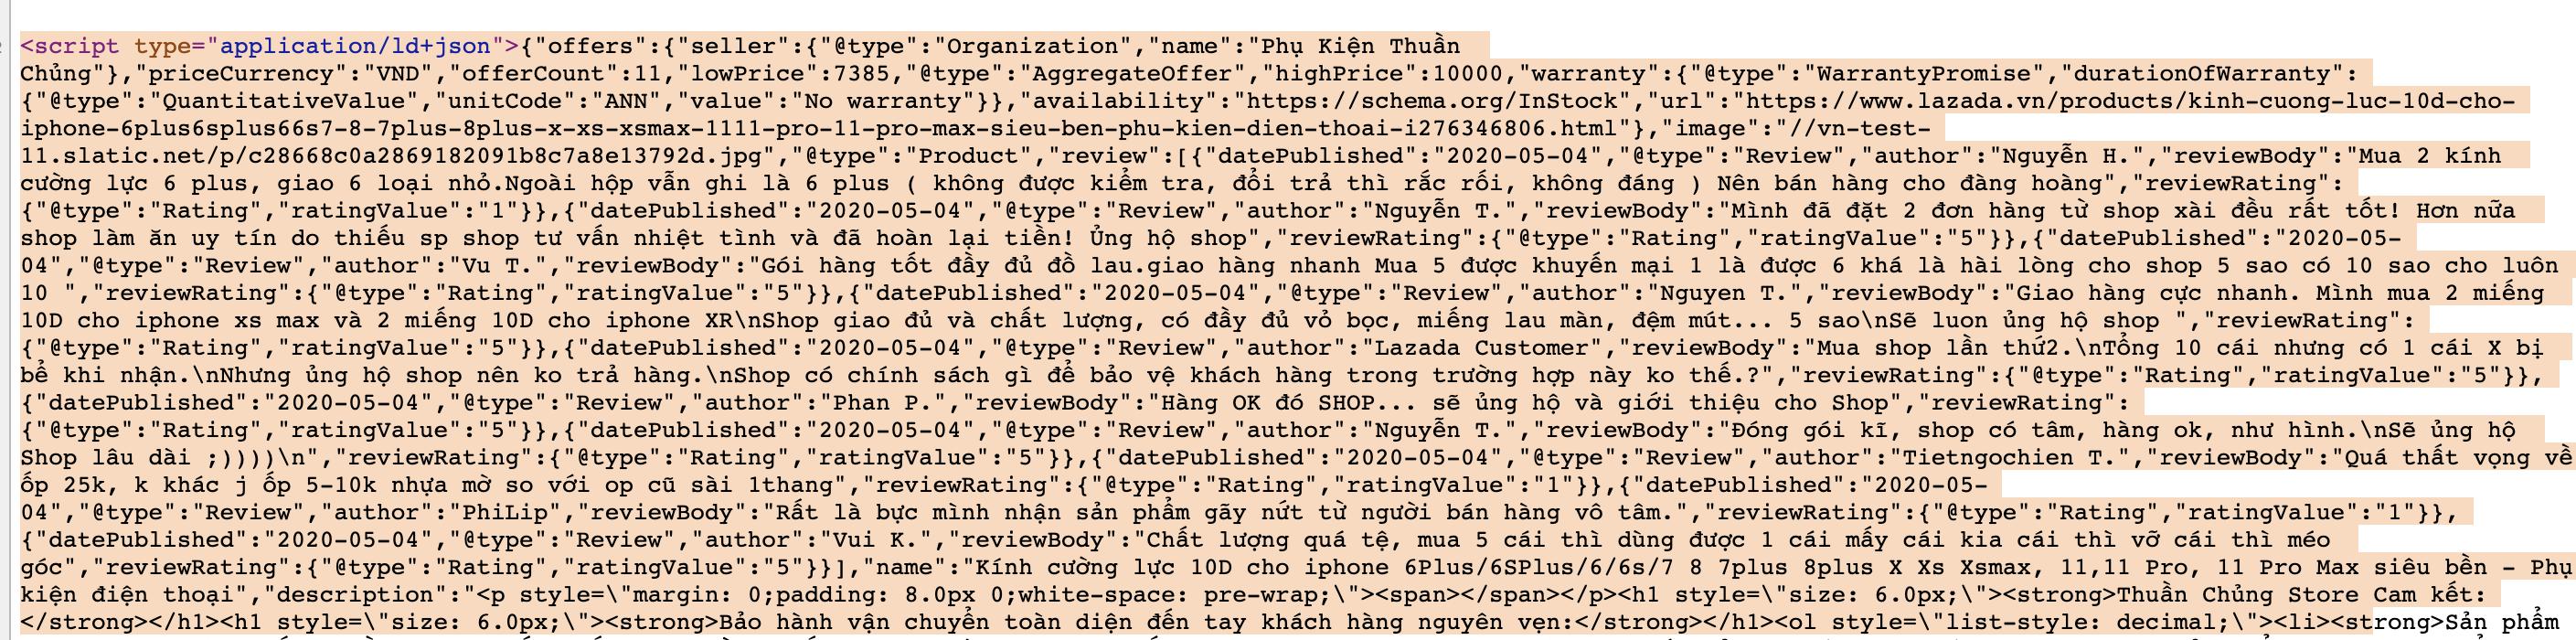 lazada product source code